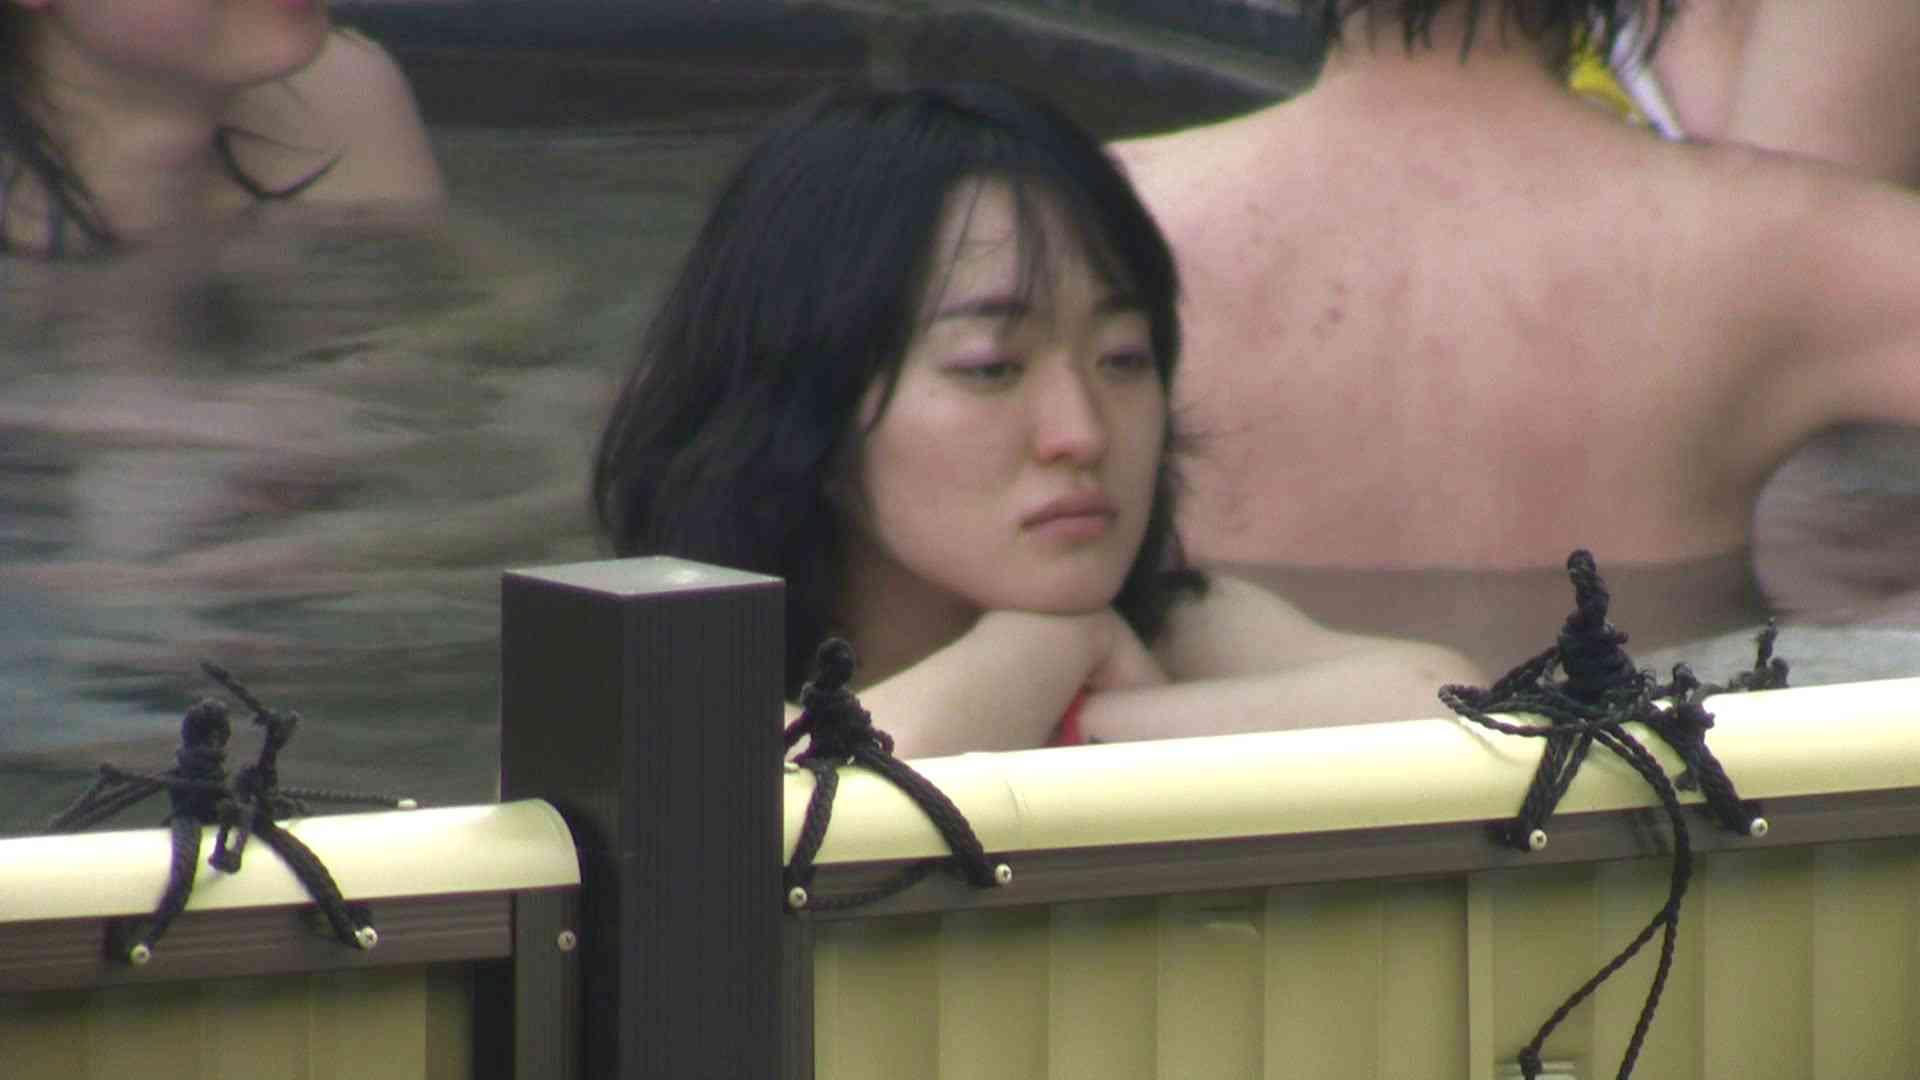 Aquaな露天風呂Vol.681 露天 | OLセックス  98画像 34